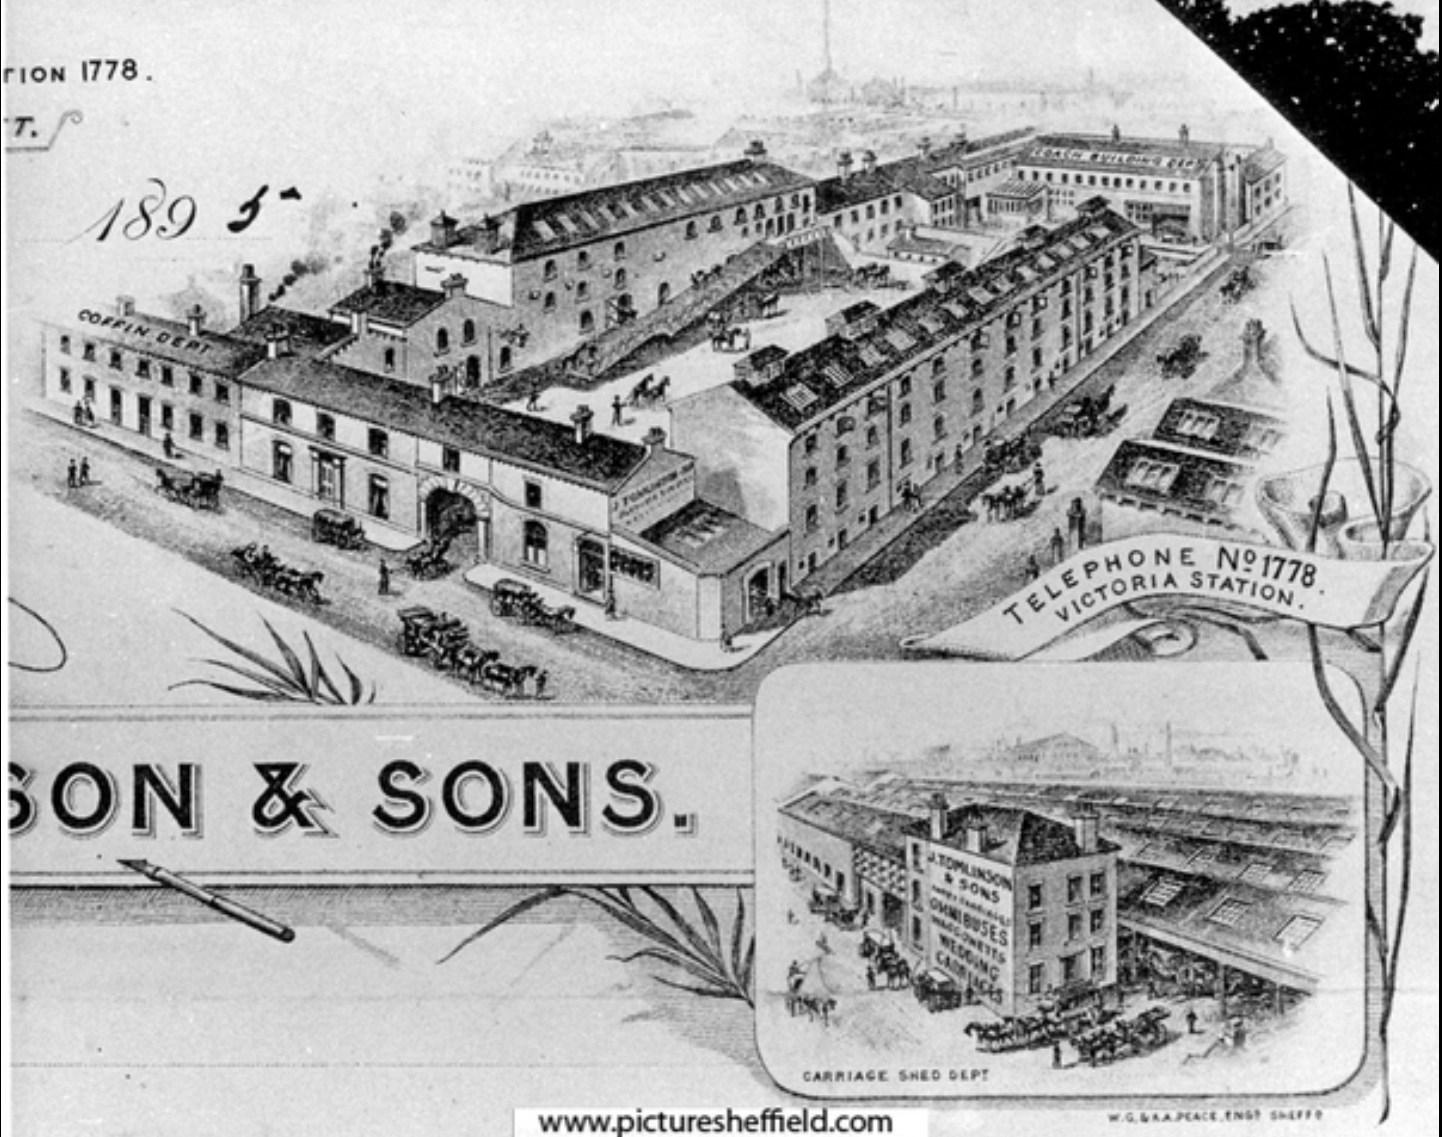 Joseph Tomlinson & Sons Ltd Borough Mews